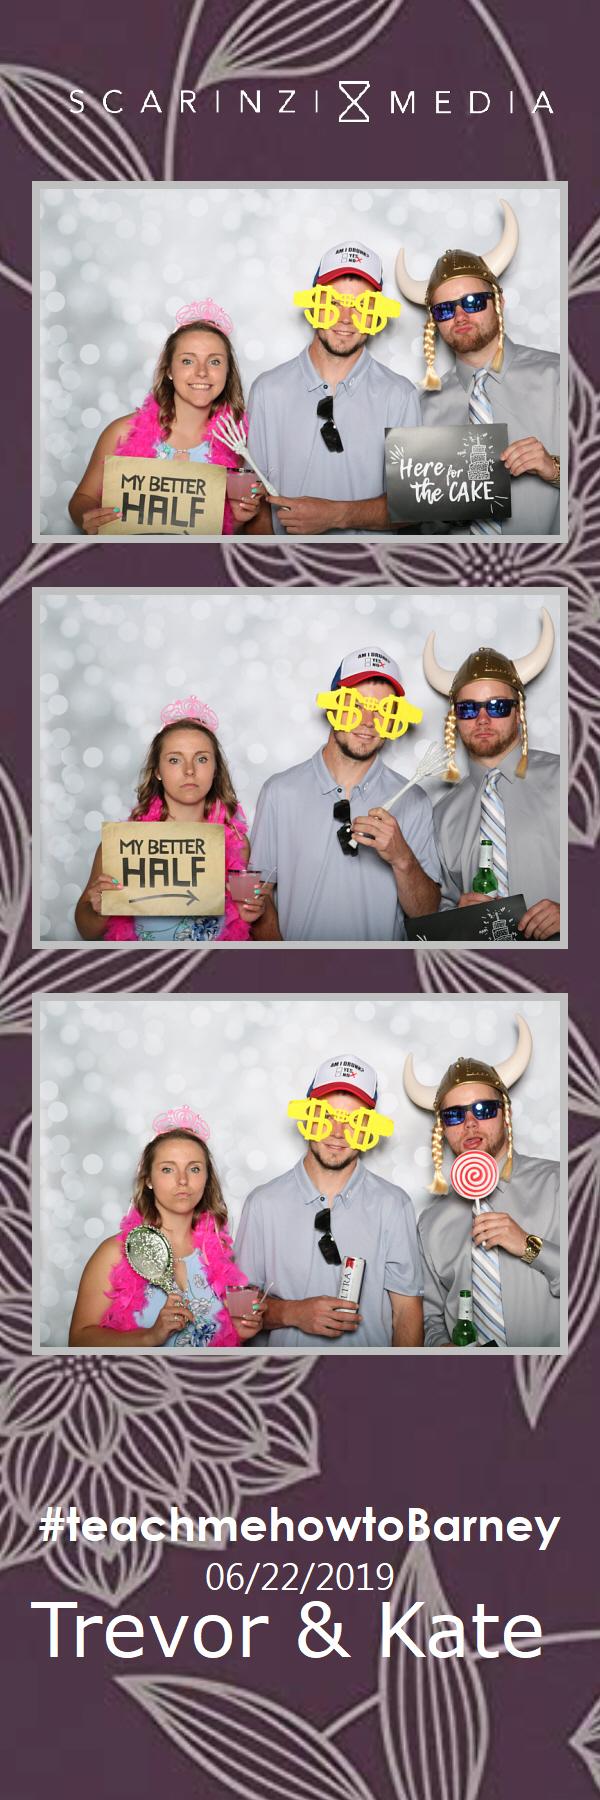 2019.06.22 - Barney Wedding PHOTOBOOTH12.jpg